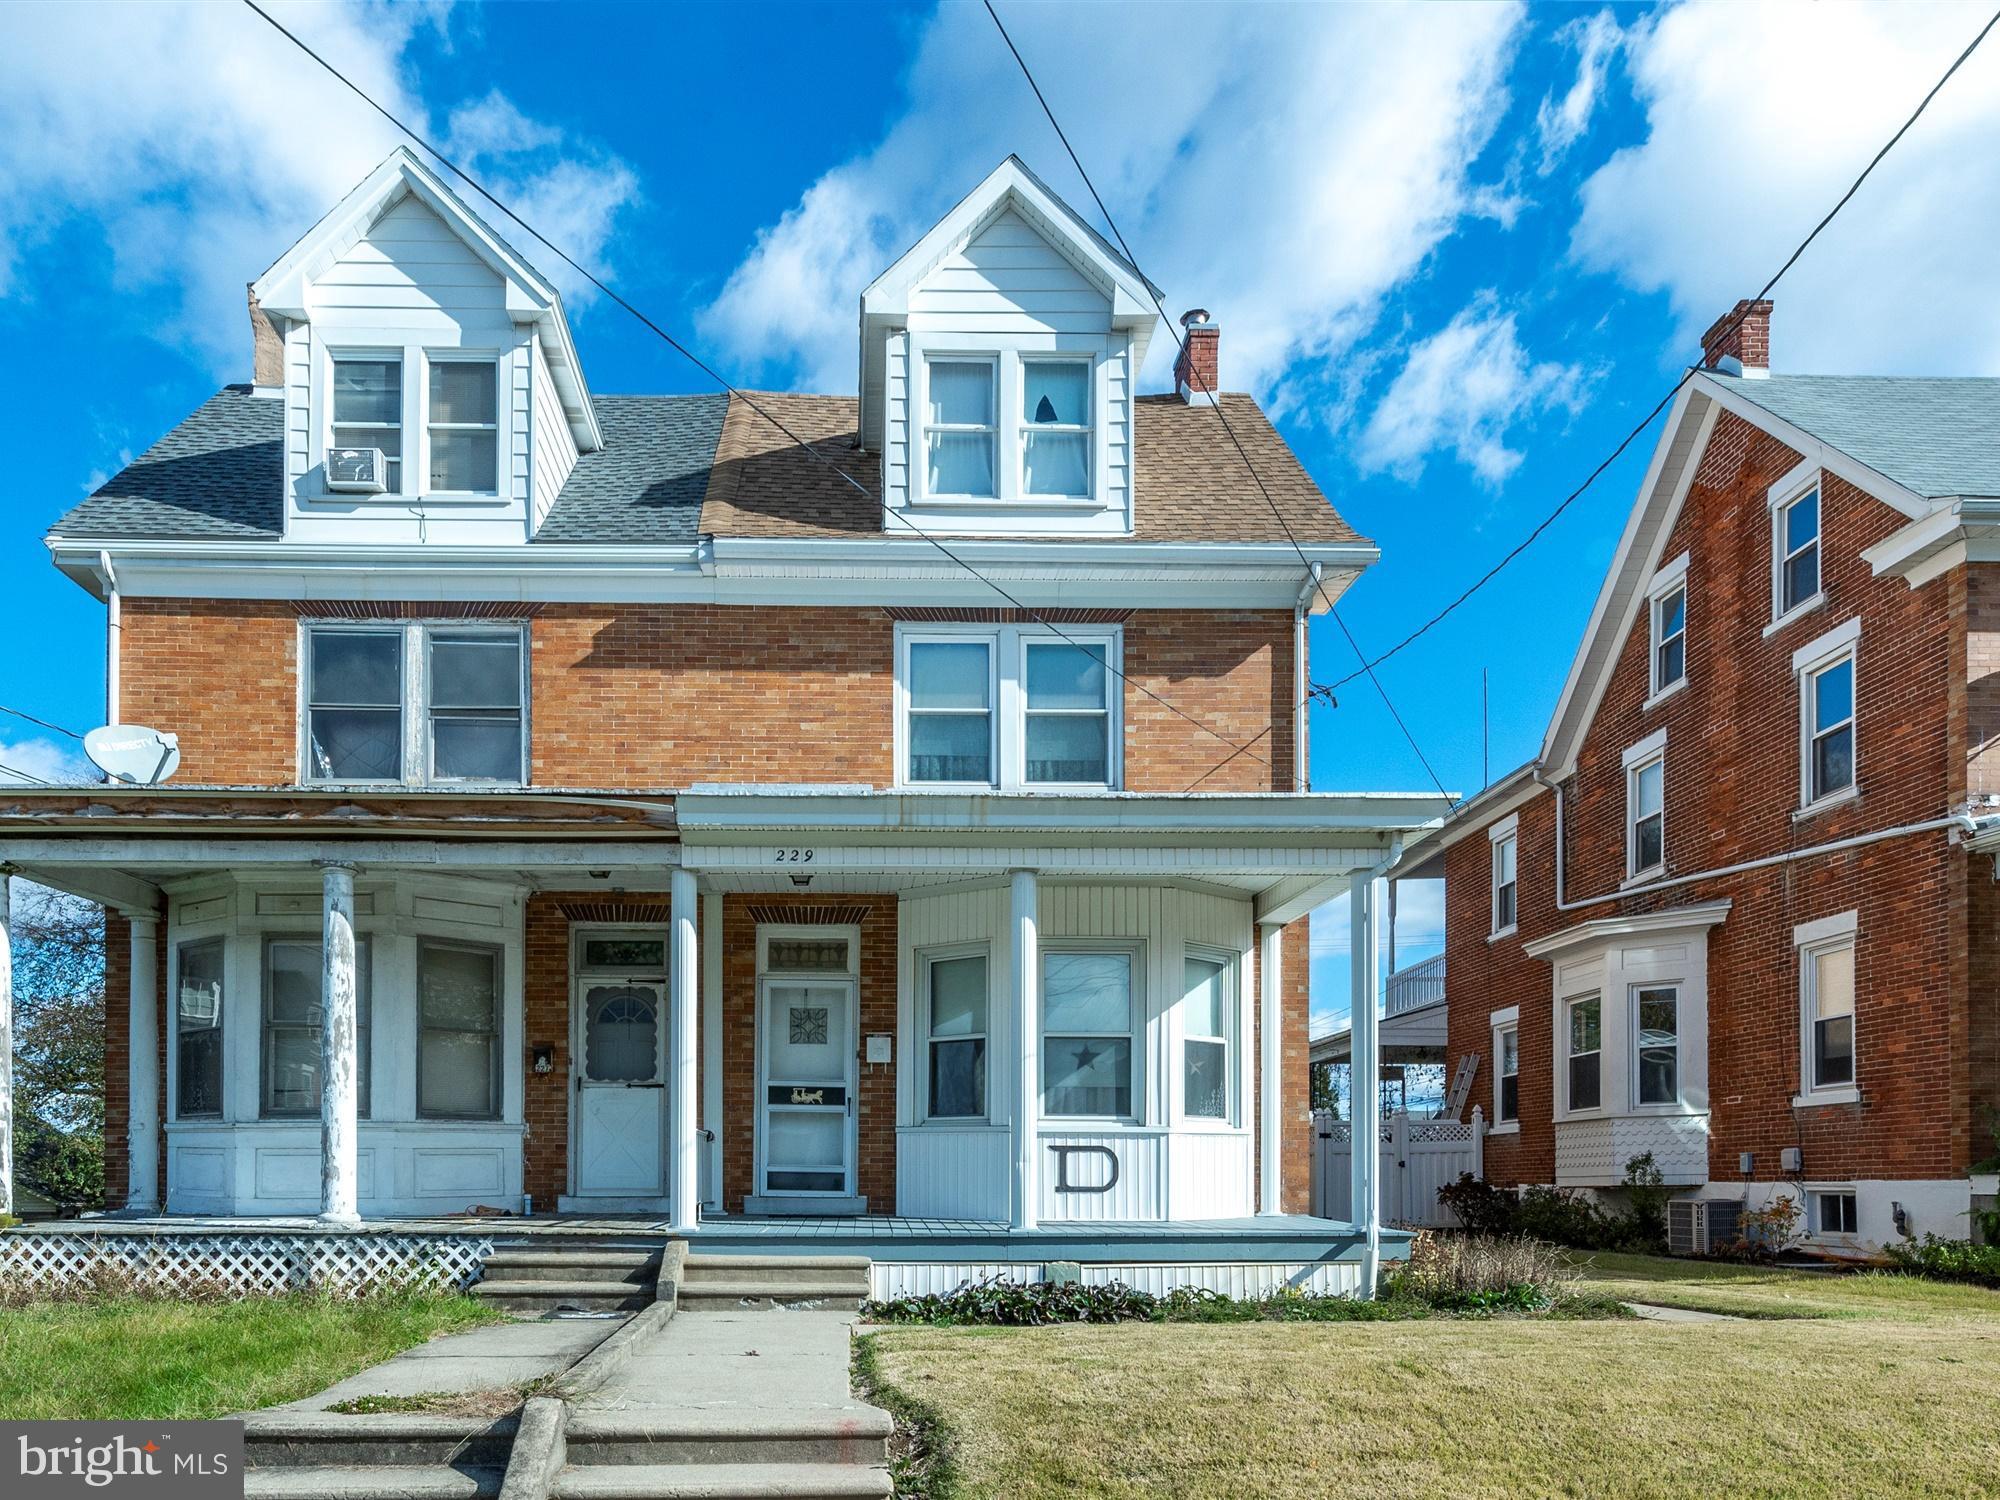 229 S HOME AVENUE, TOPTON, PA 19562